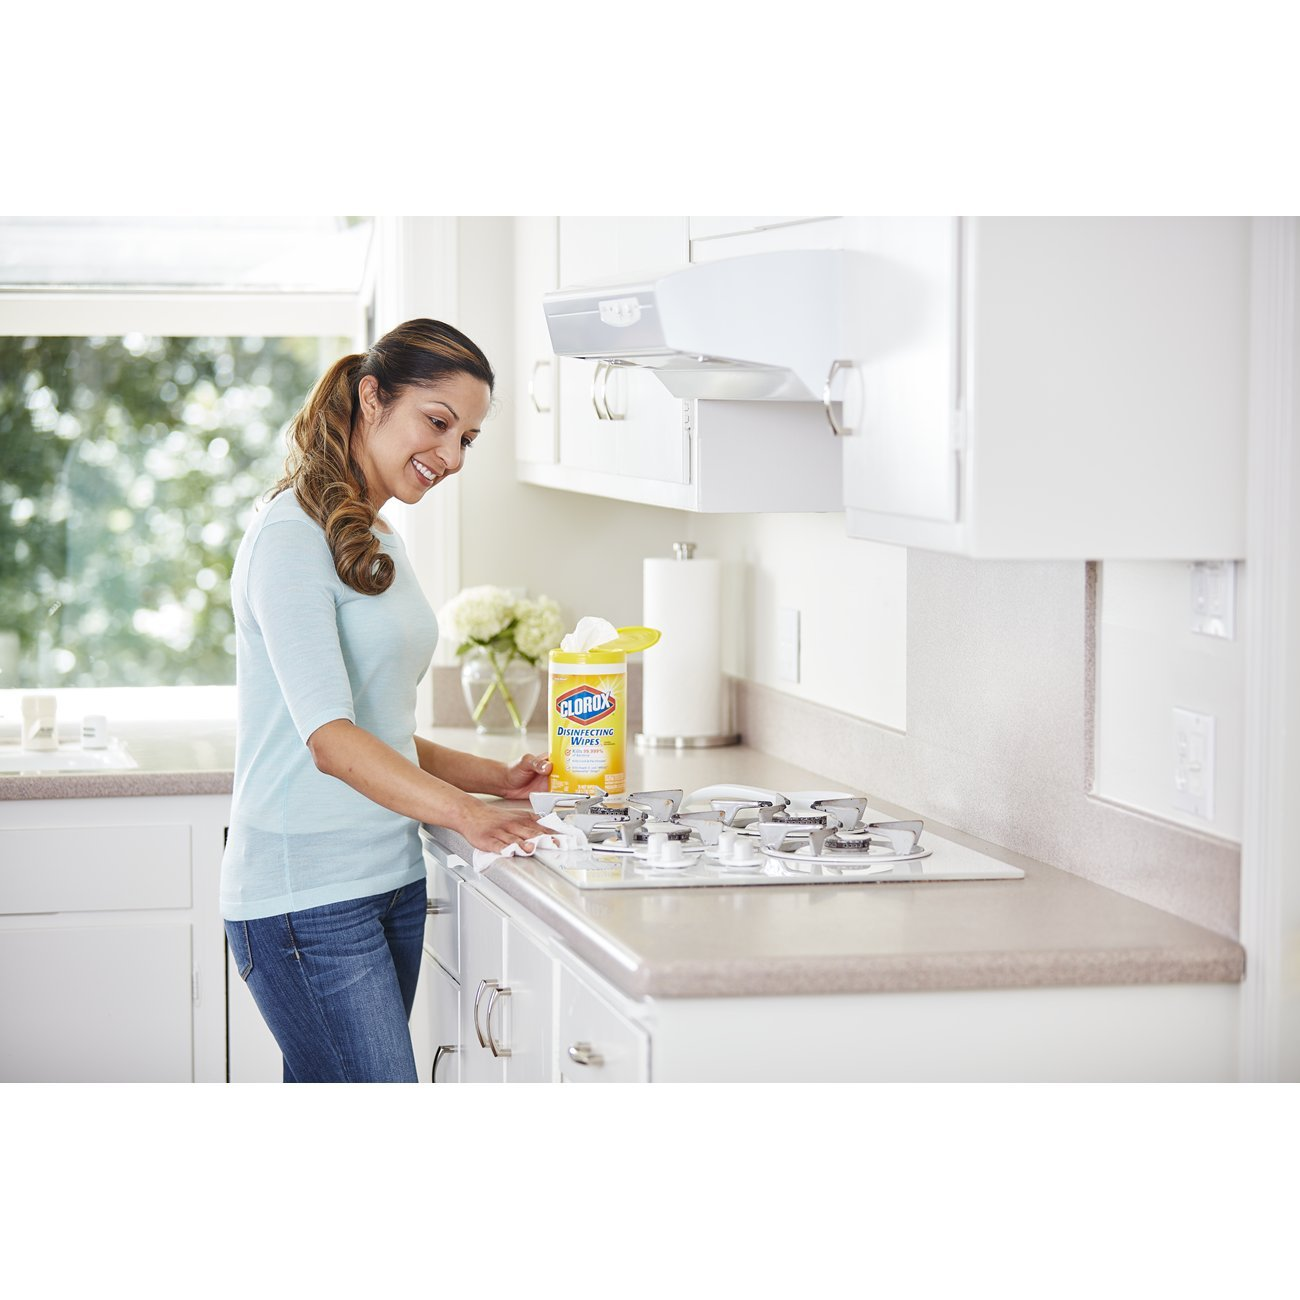 Amazon.com: Clorox Disinfecting Wipes, Citrus Blend, 75 Wet Wipes ...